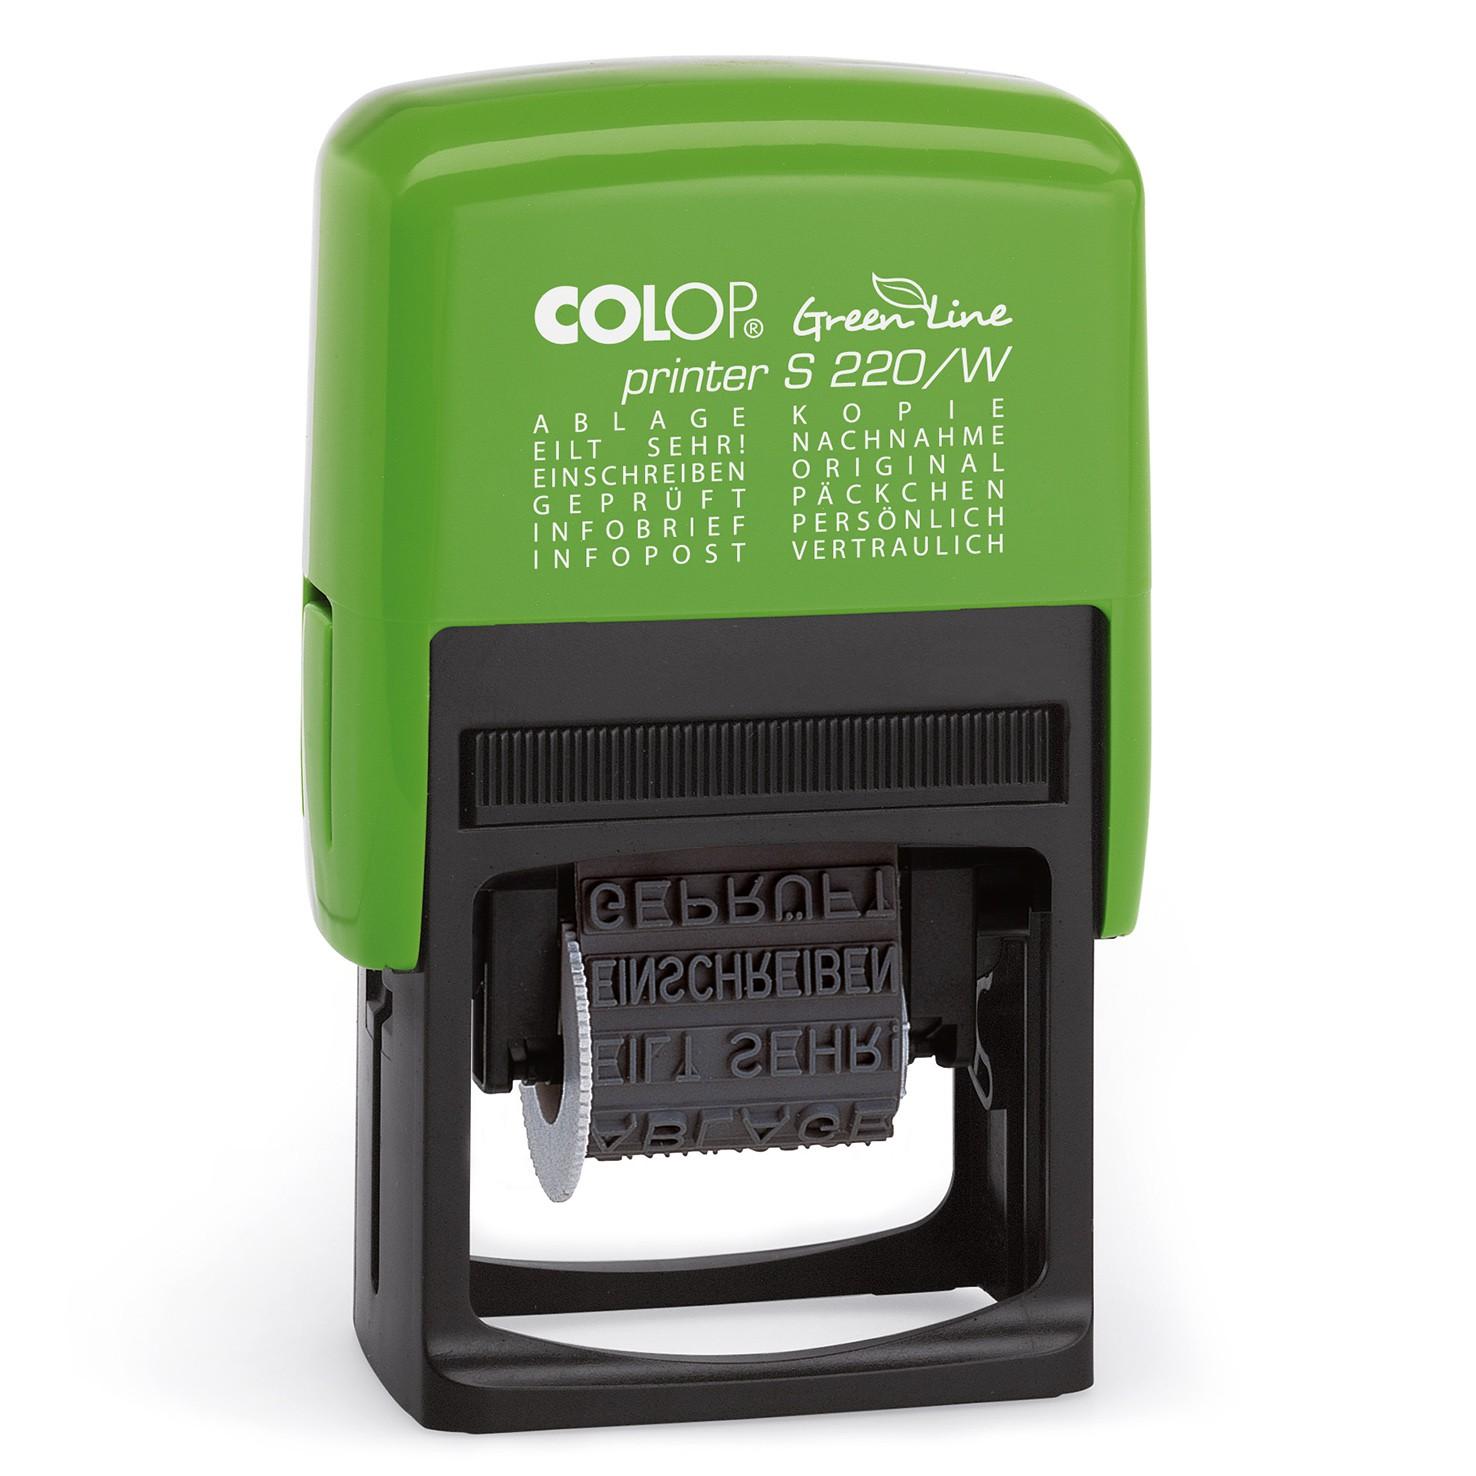 COLOP Green Line Printer Stempel mit 12 Stempeltexten - S220/W Wortbandstempel